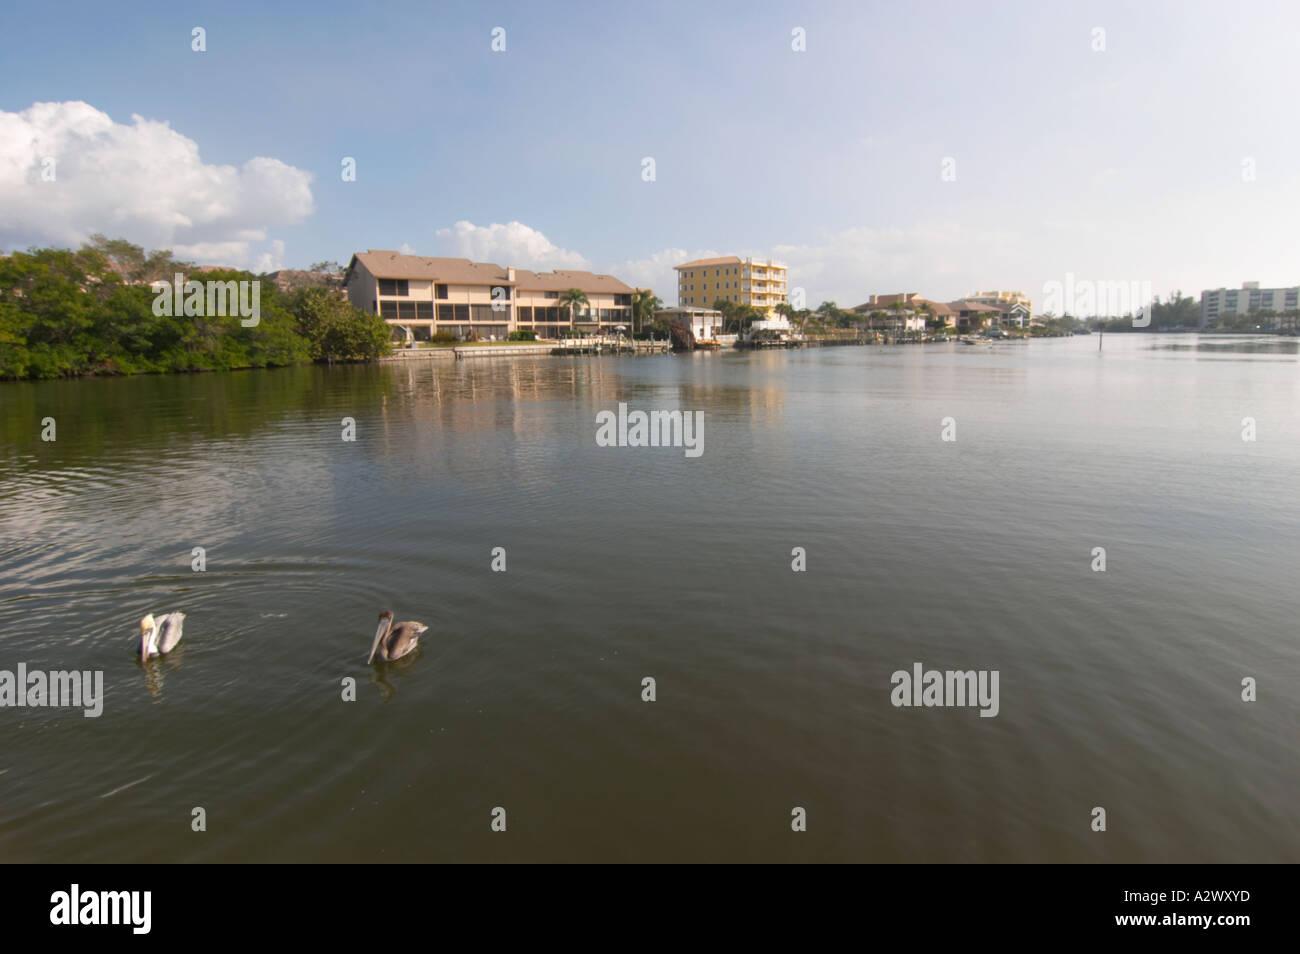 BLIND PASS LAGOON OR TURTLE BEACH LAGOON ON SIESTA KEY IN SOUTH WEST FLORIDA